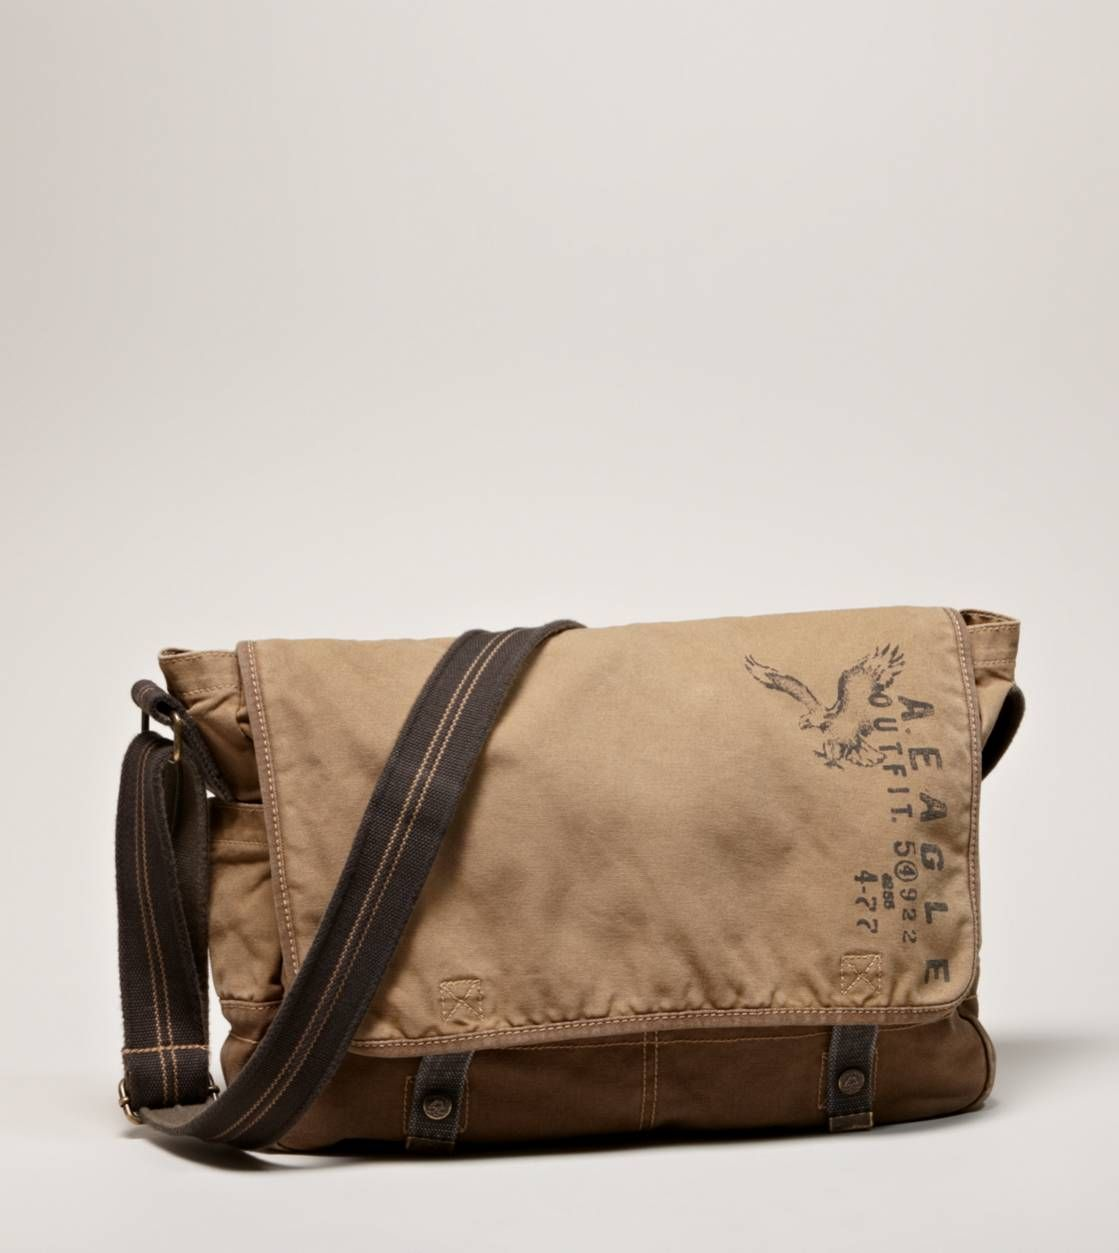 95e4303b2edd AEO Canvas Messenger Bag | Clothes Accesories in 2019 | Canvas ...